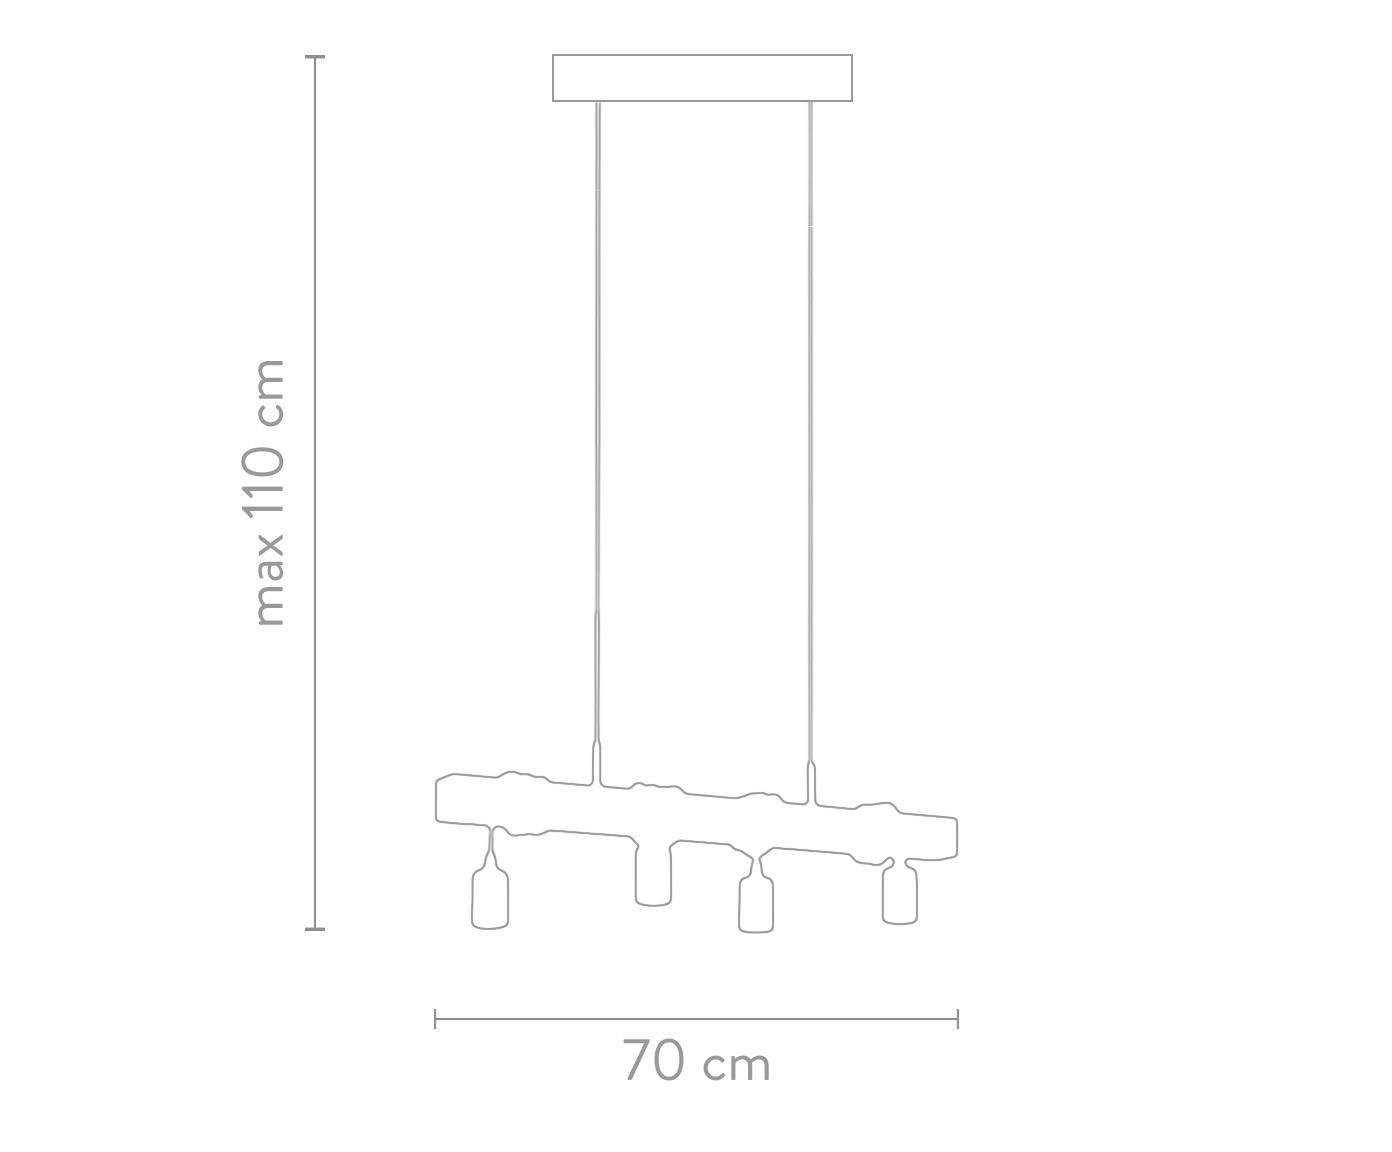 Hanglamp Townshend, Zwart, houtkleurig, 70 x 25 cm